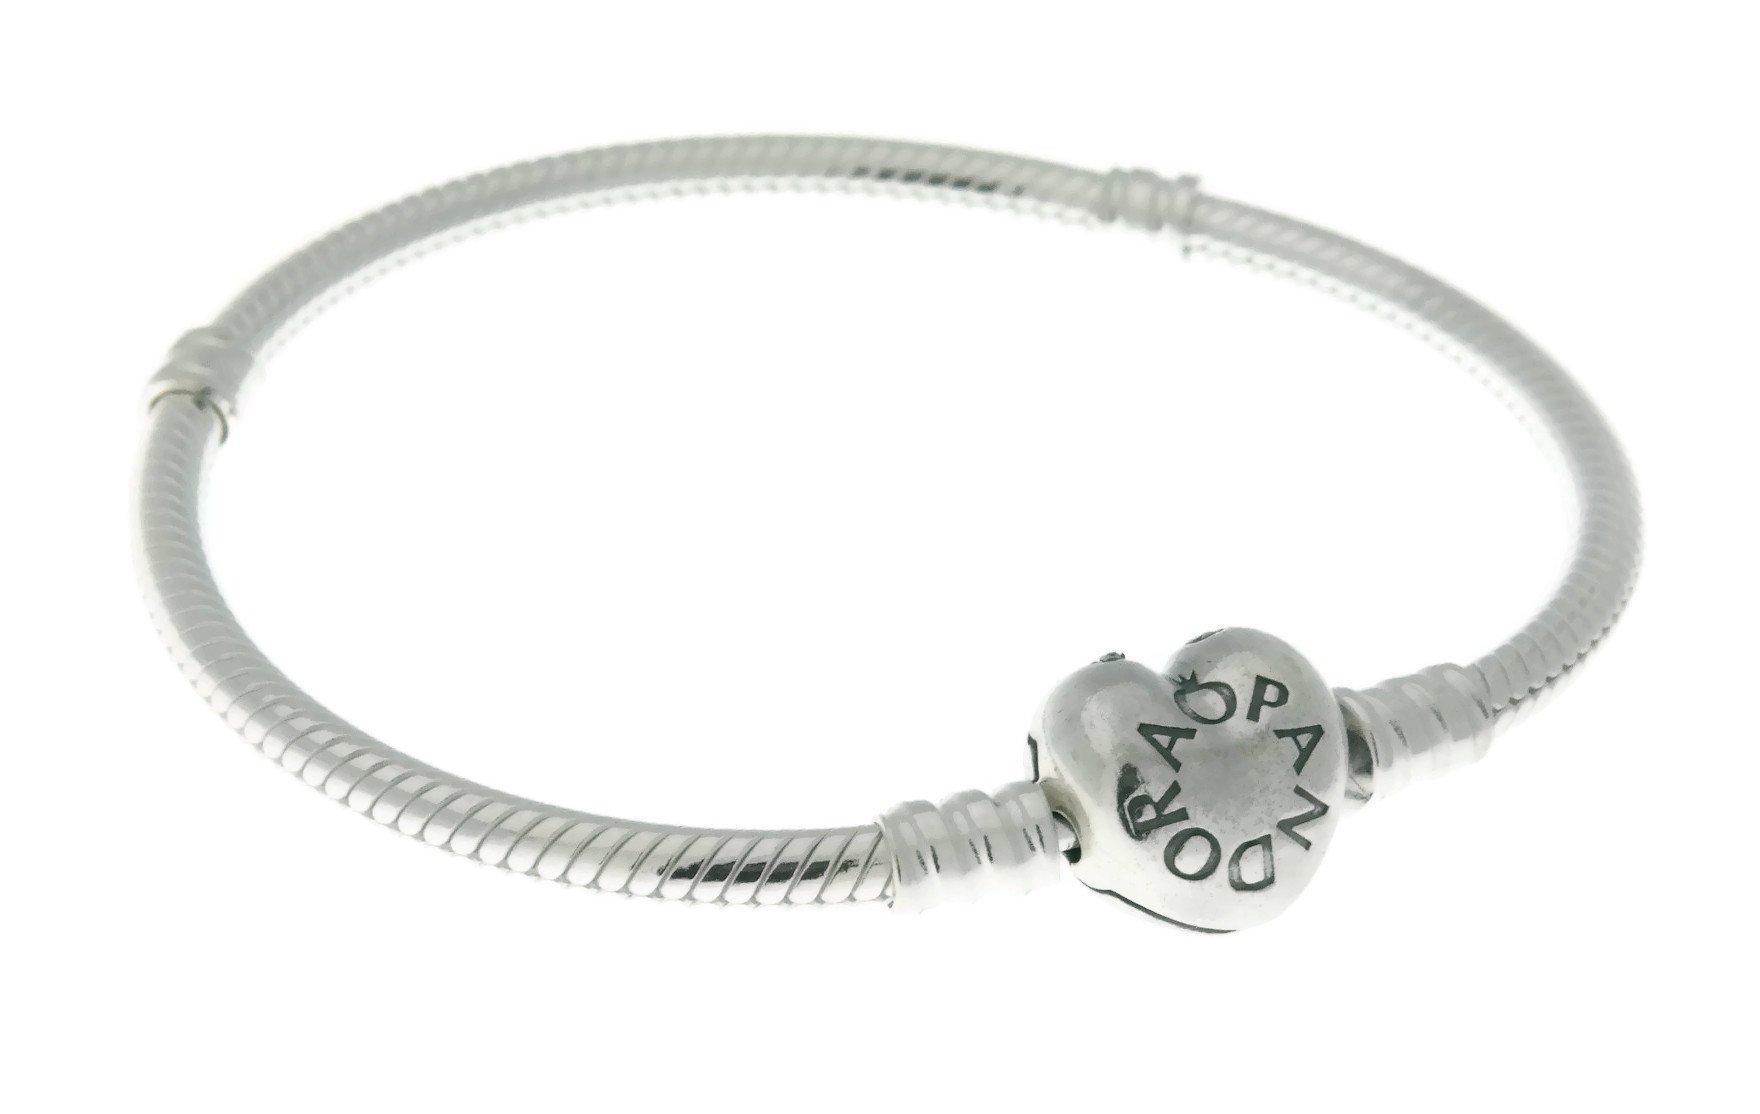 Pandora-Womens-Silver-Bracelet-with-Heart-Clasp-71-590719-18